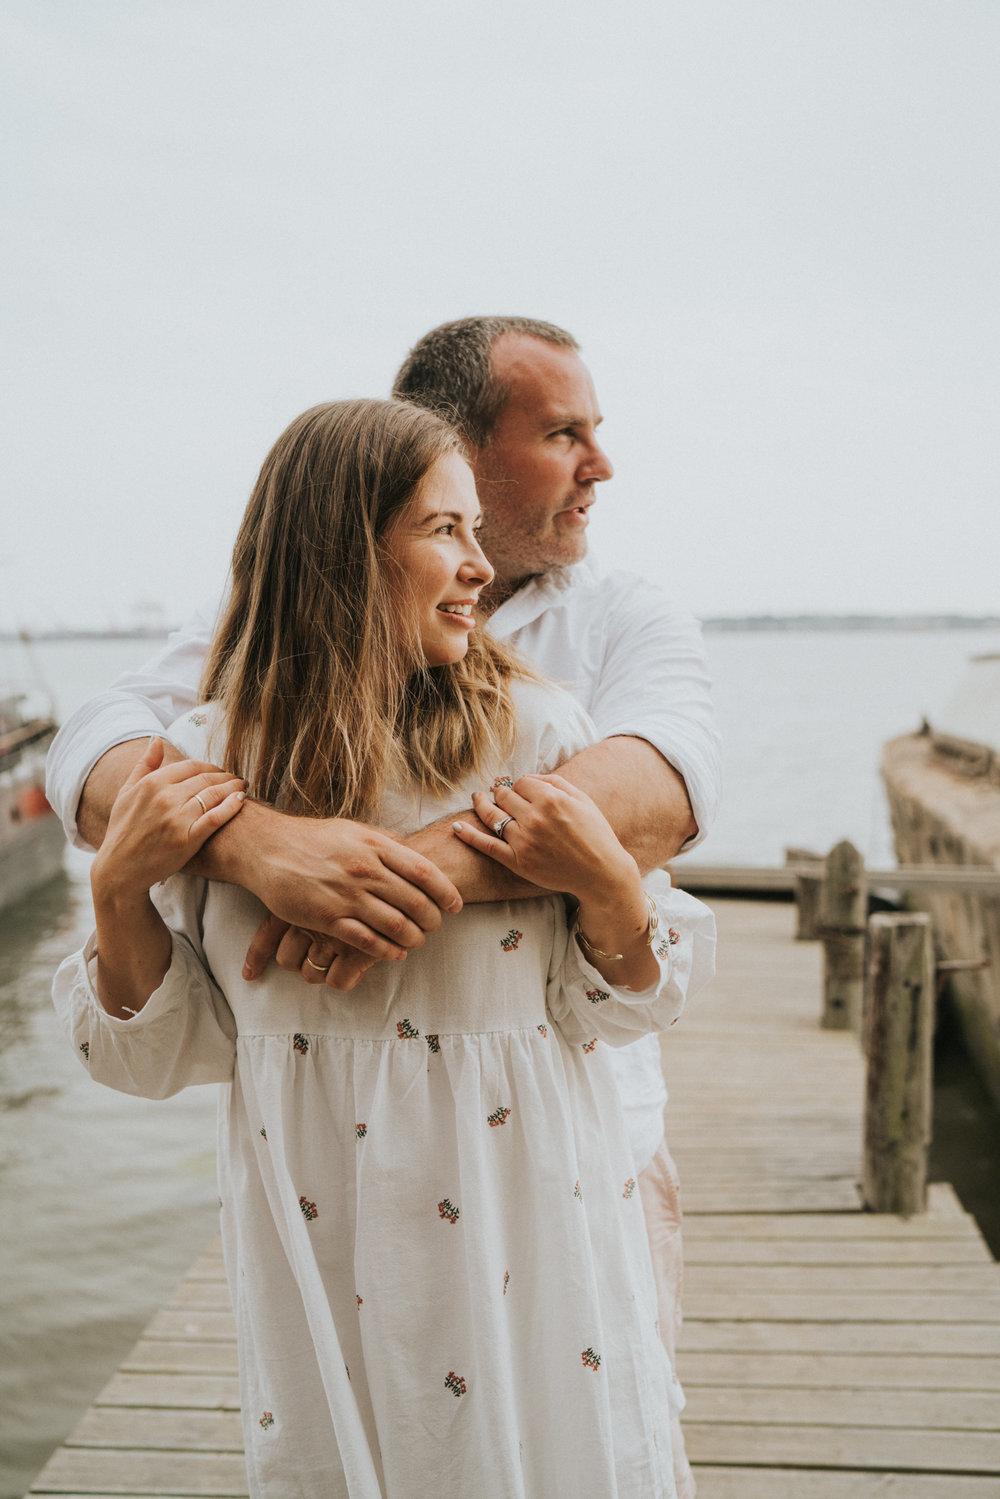 Parkers-Extended-Family-Session-Grace-Elizabeth-Alternative-Wedding-Lifestyle-Photographer-Colchester-Essex-Norfolk-Suffolk-Devon (18 of 62).jpg